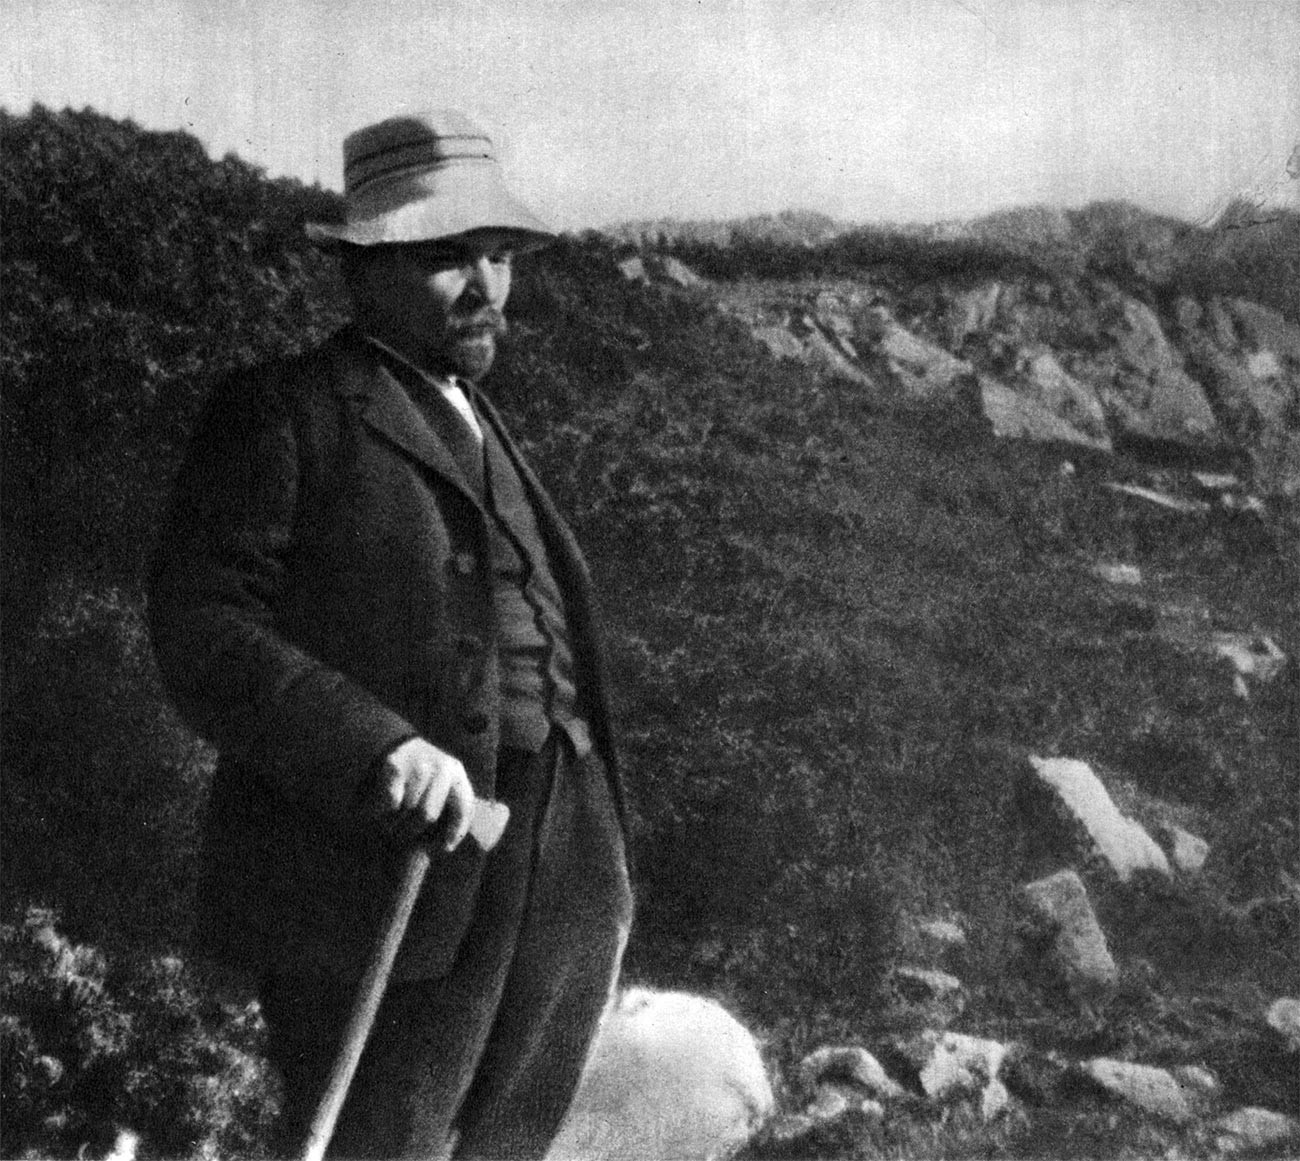 Vladimir Lenin di Zakopane, Polandia, 1914